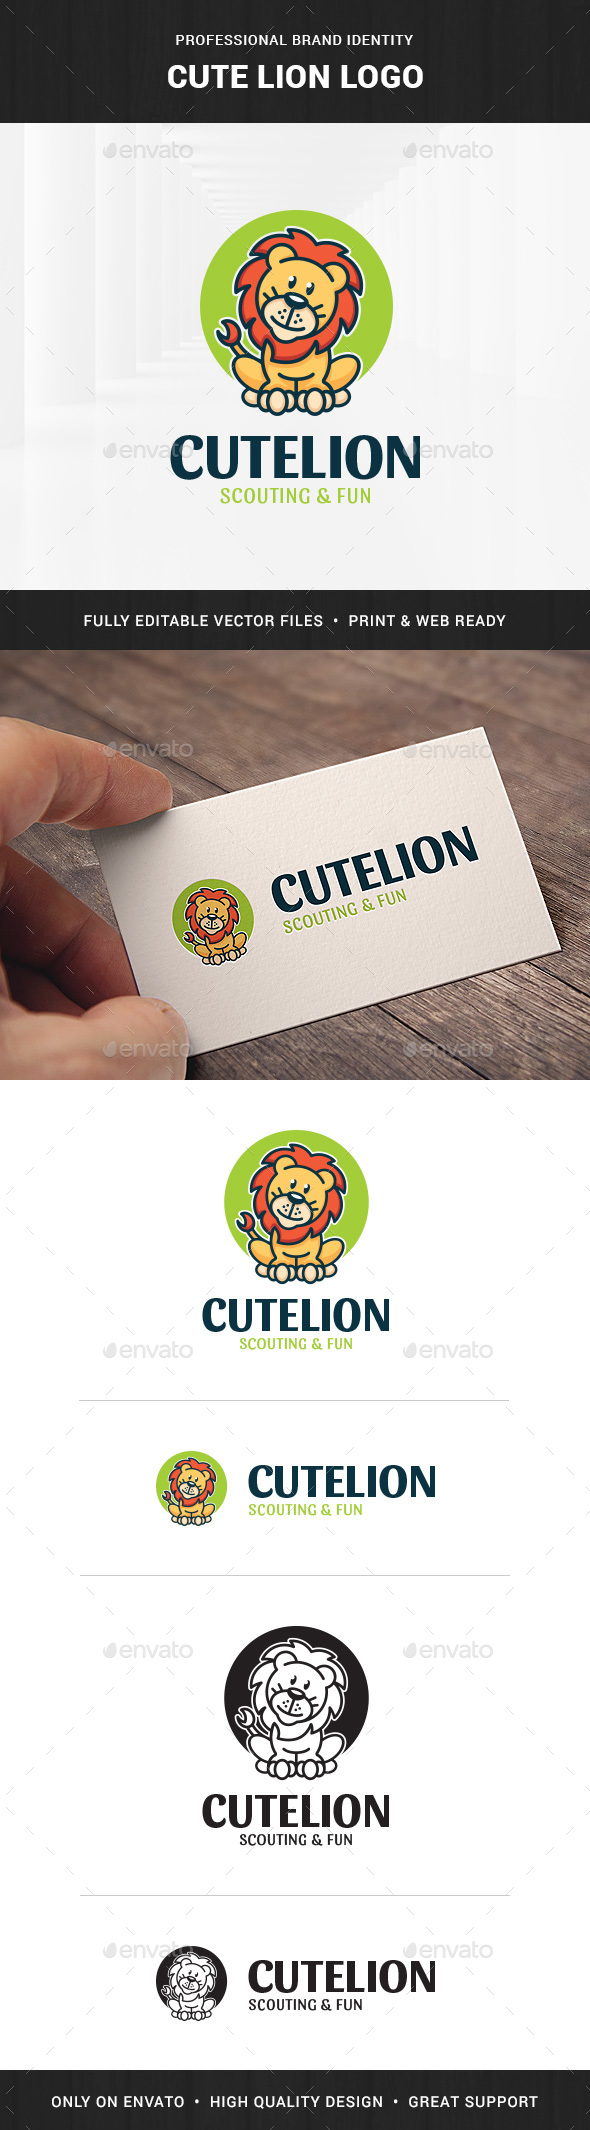 Cute Lion Logo Template - Animals Logo Templates